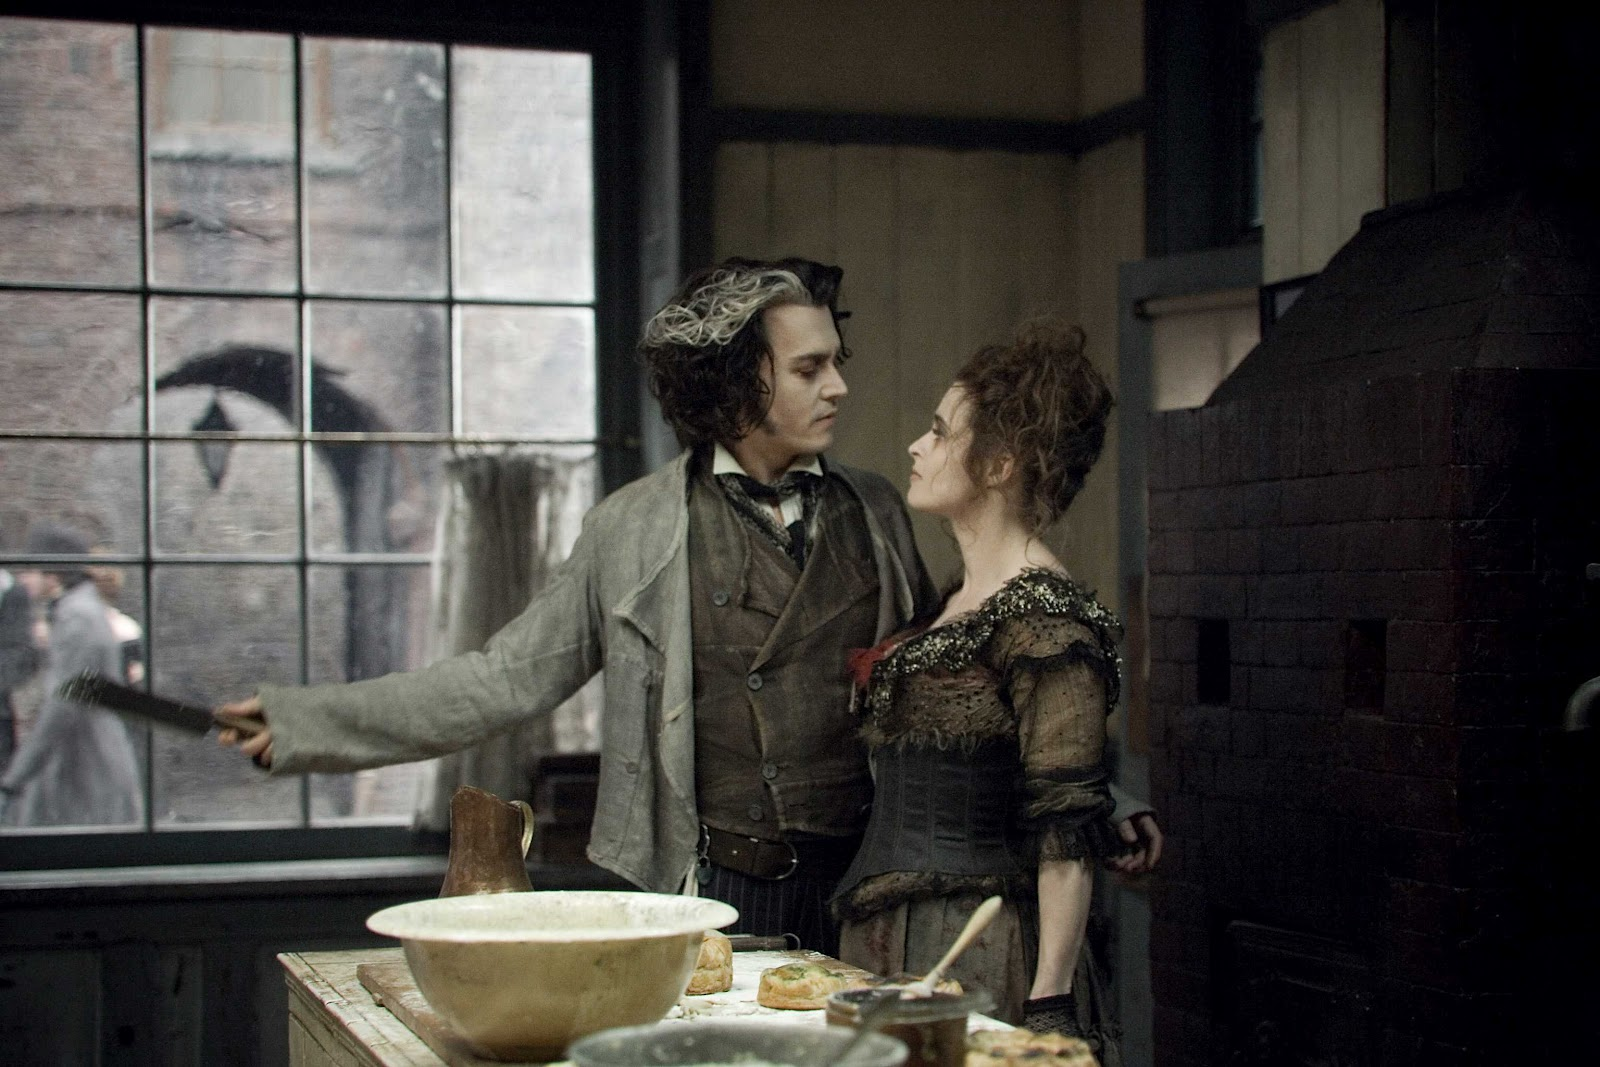 Music N' More: Sweeney Todd: The Demon Barber of Fleet Street